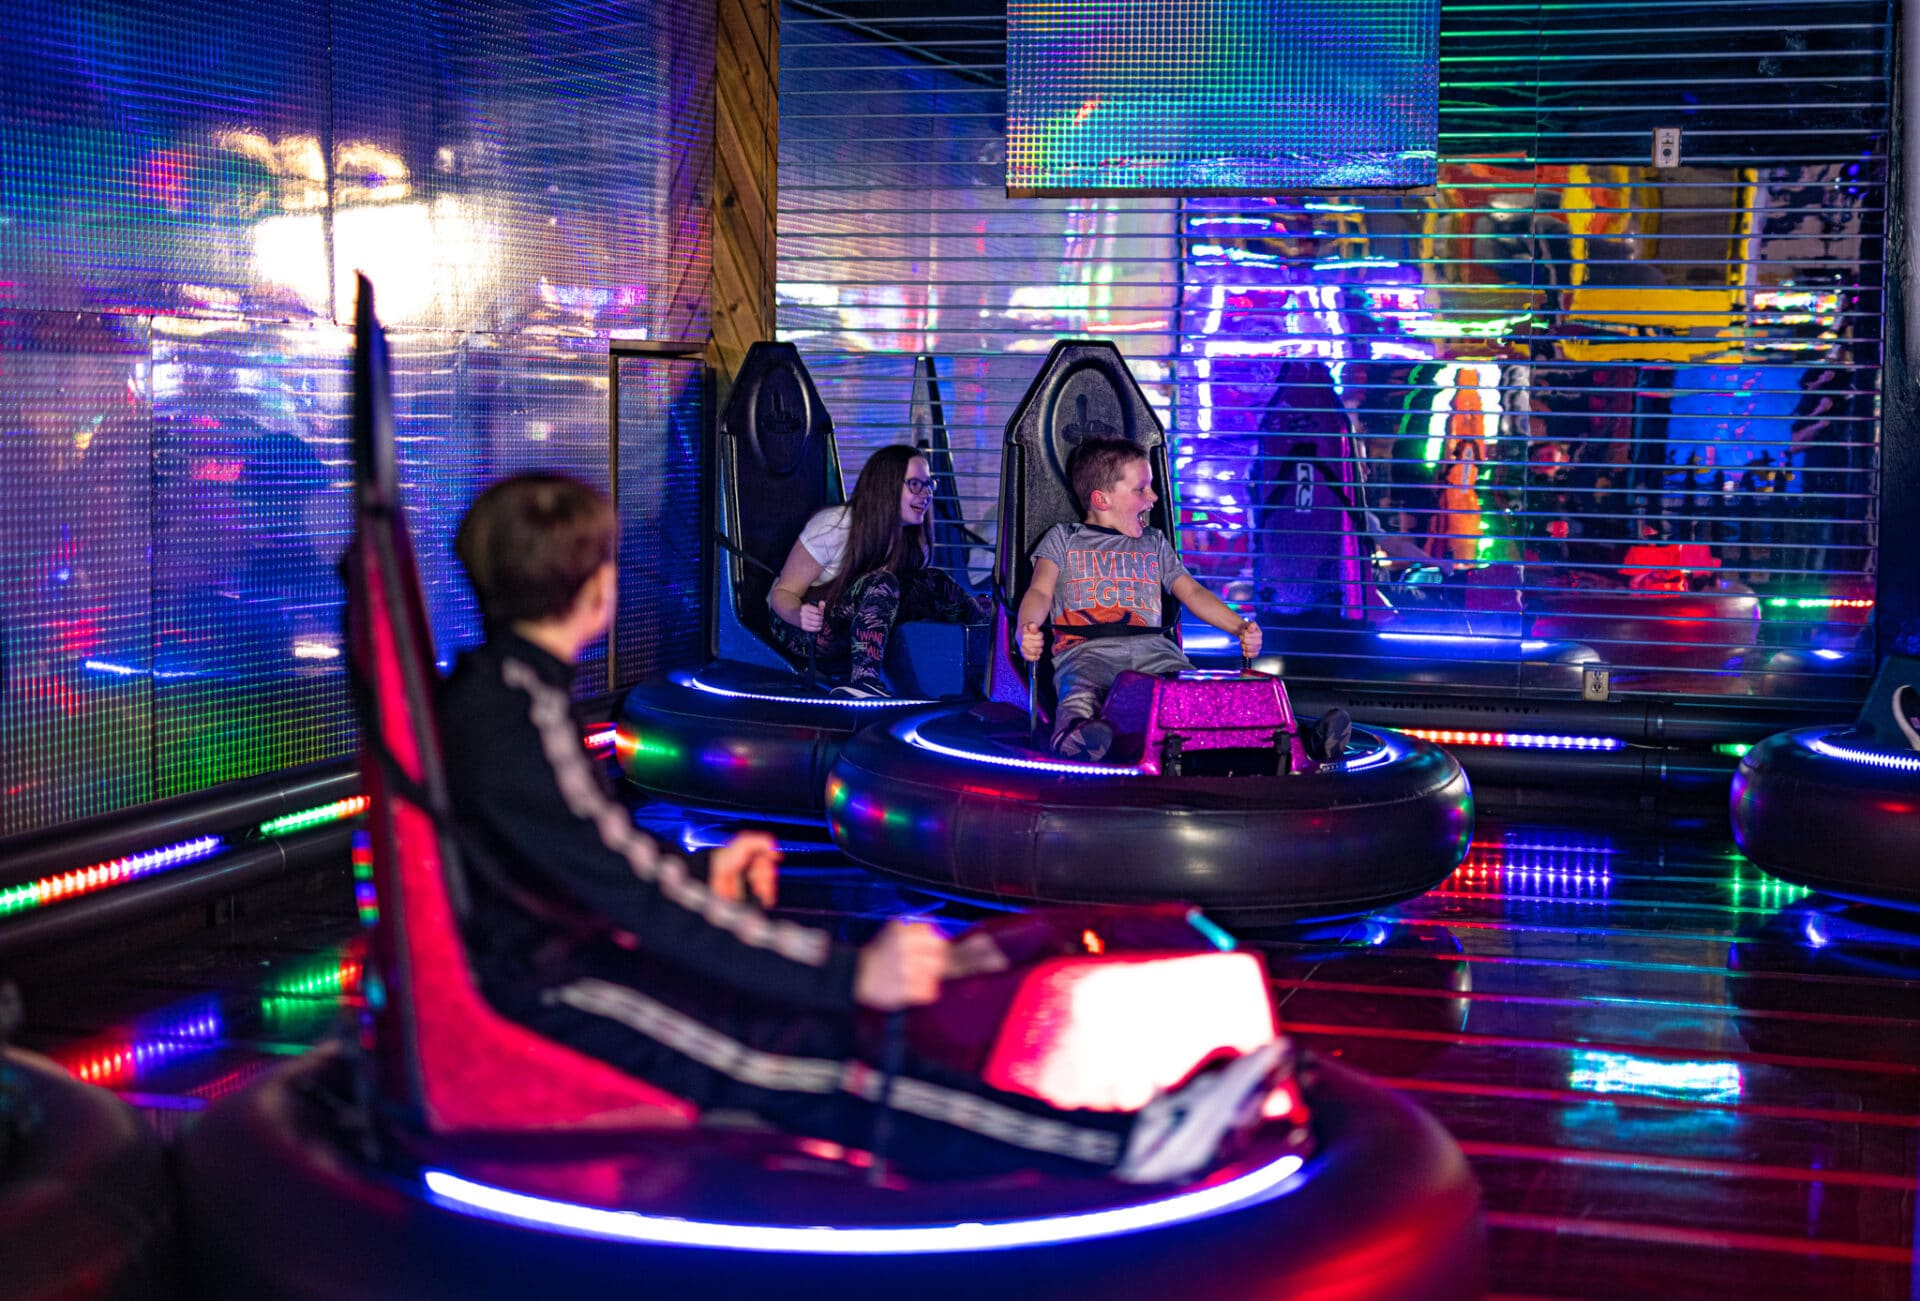 amusement park in kenosha, kenosha amusement park, action territory